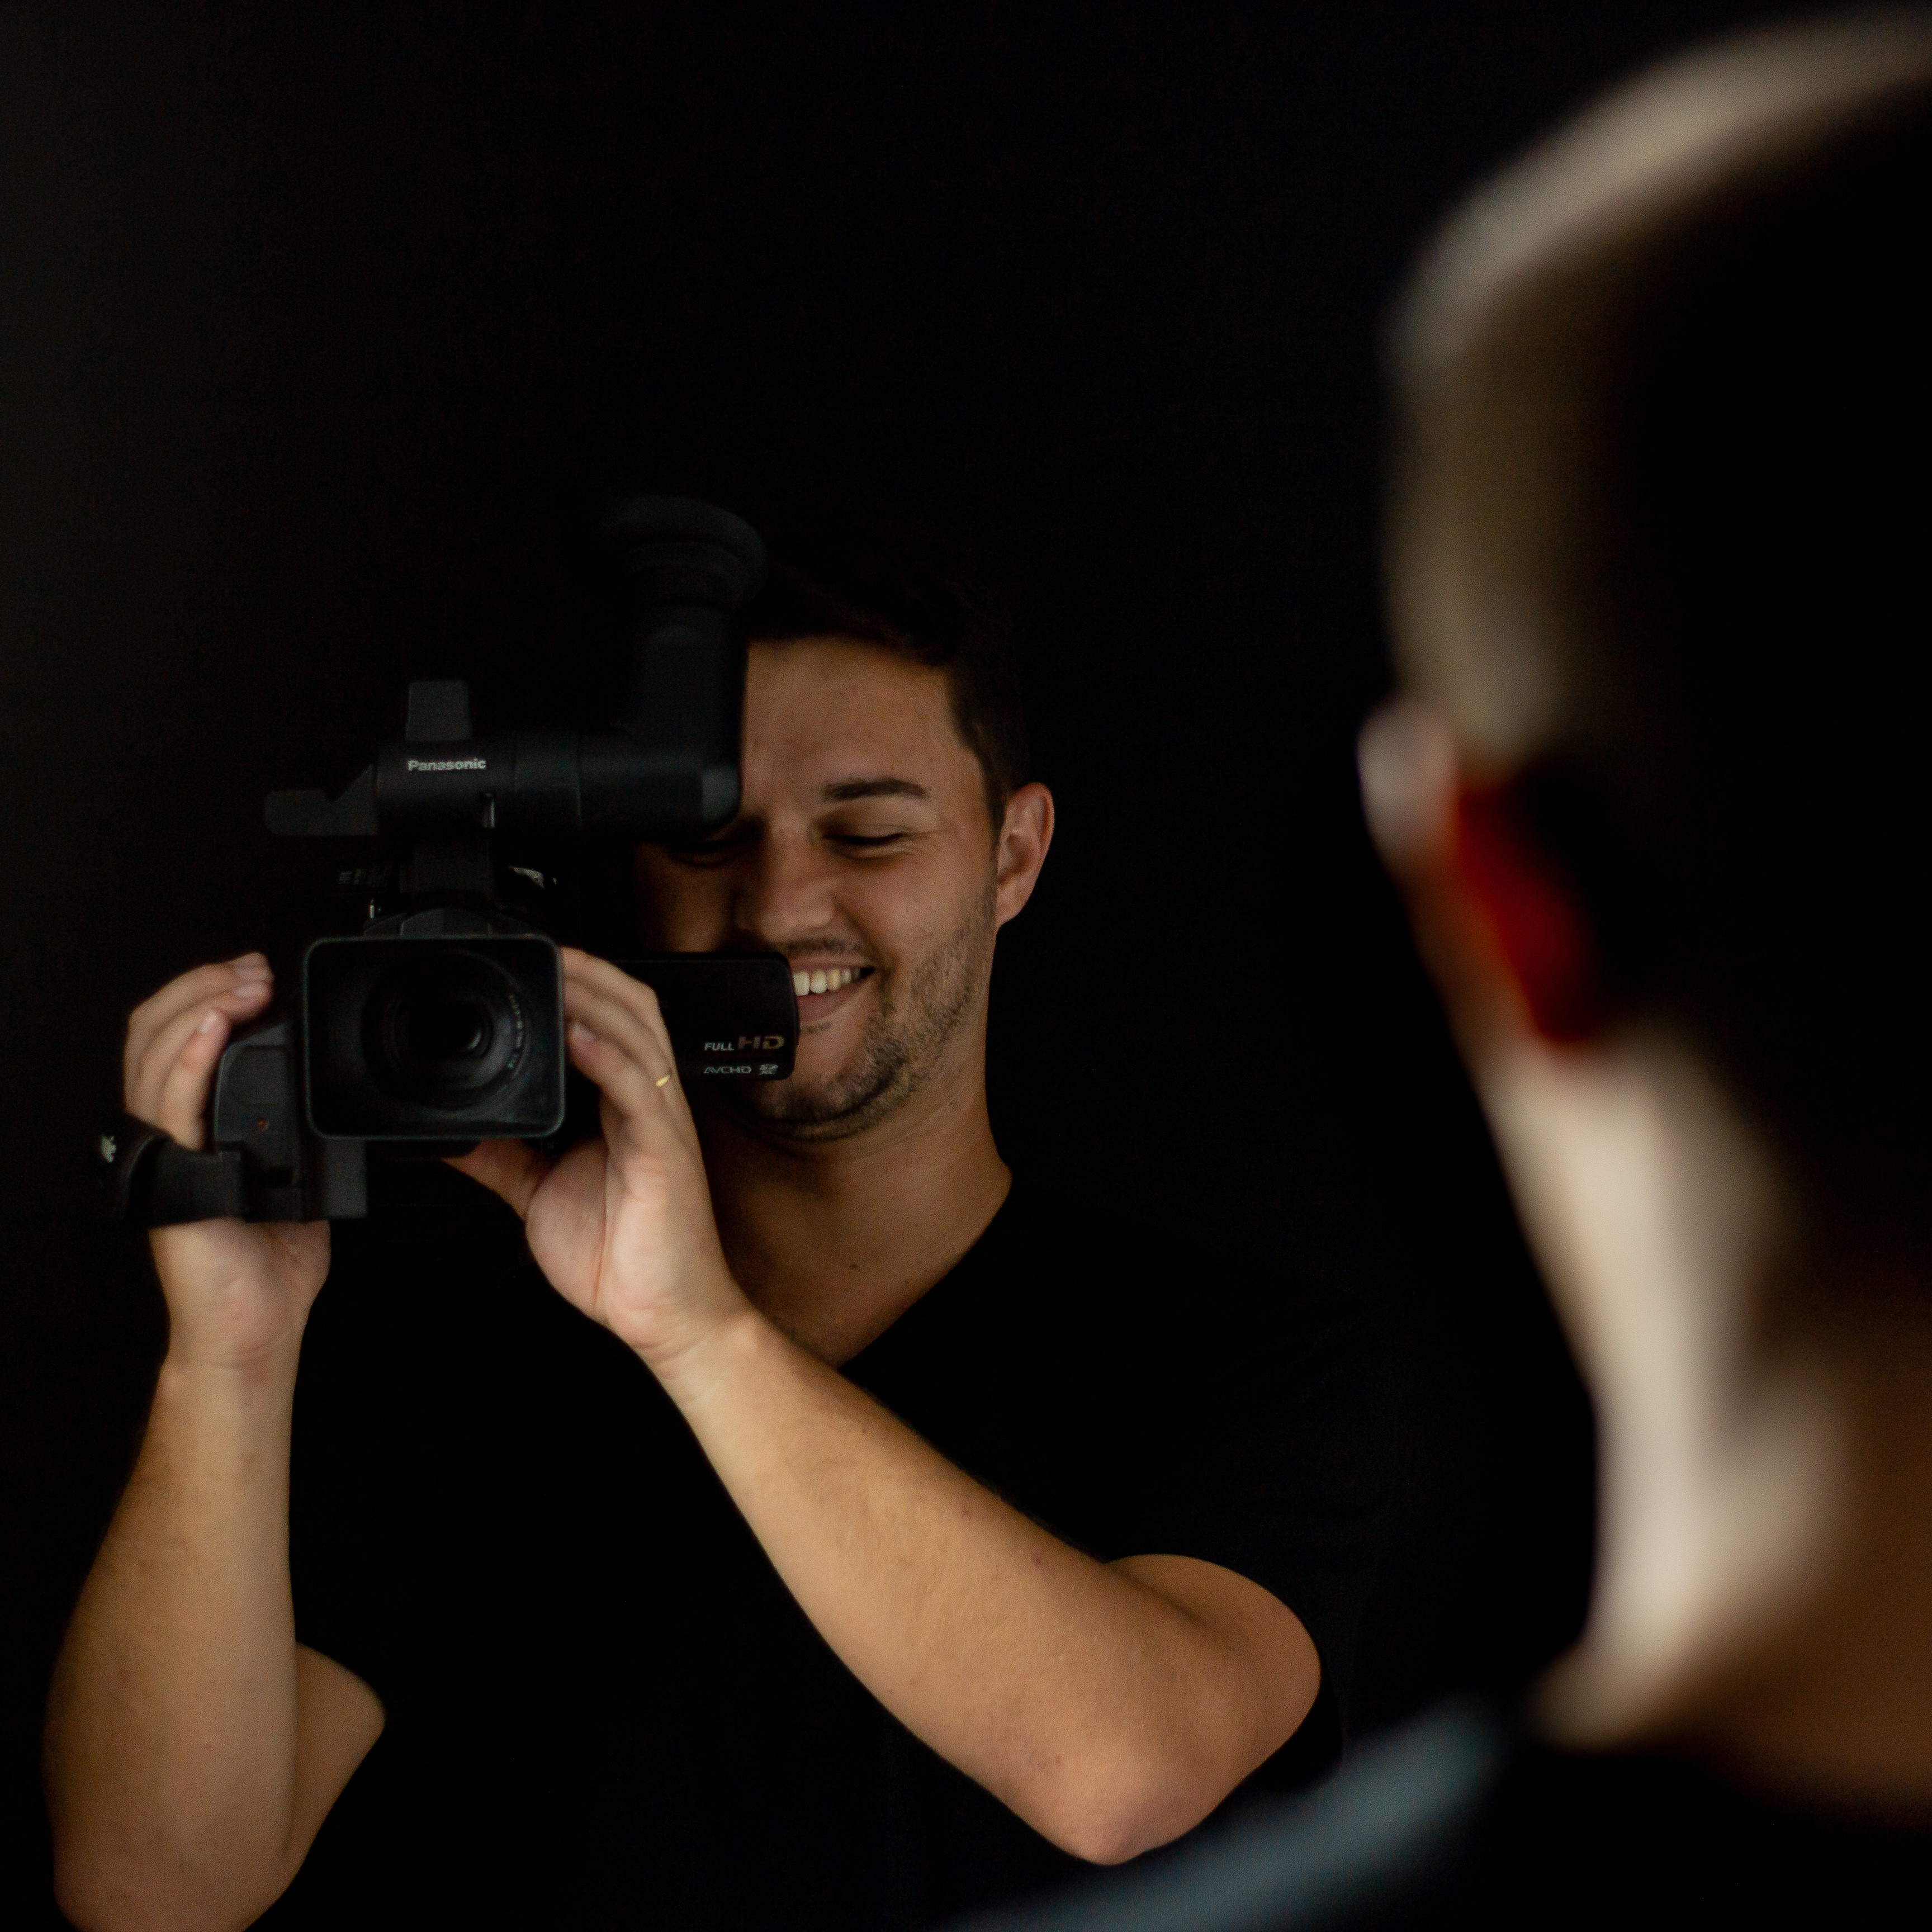 Fotografia ou vídeo